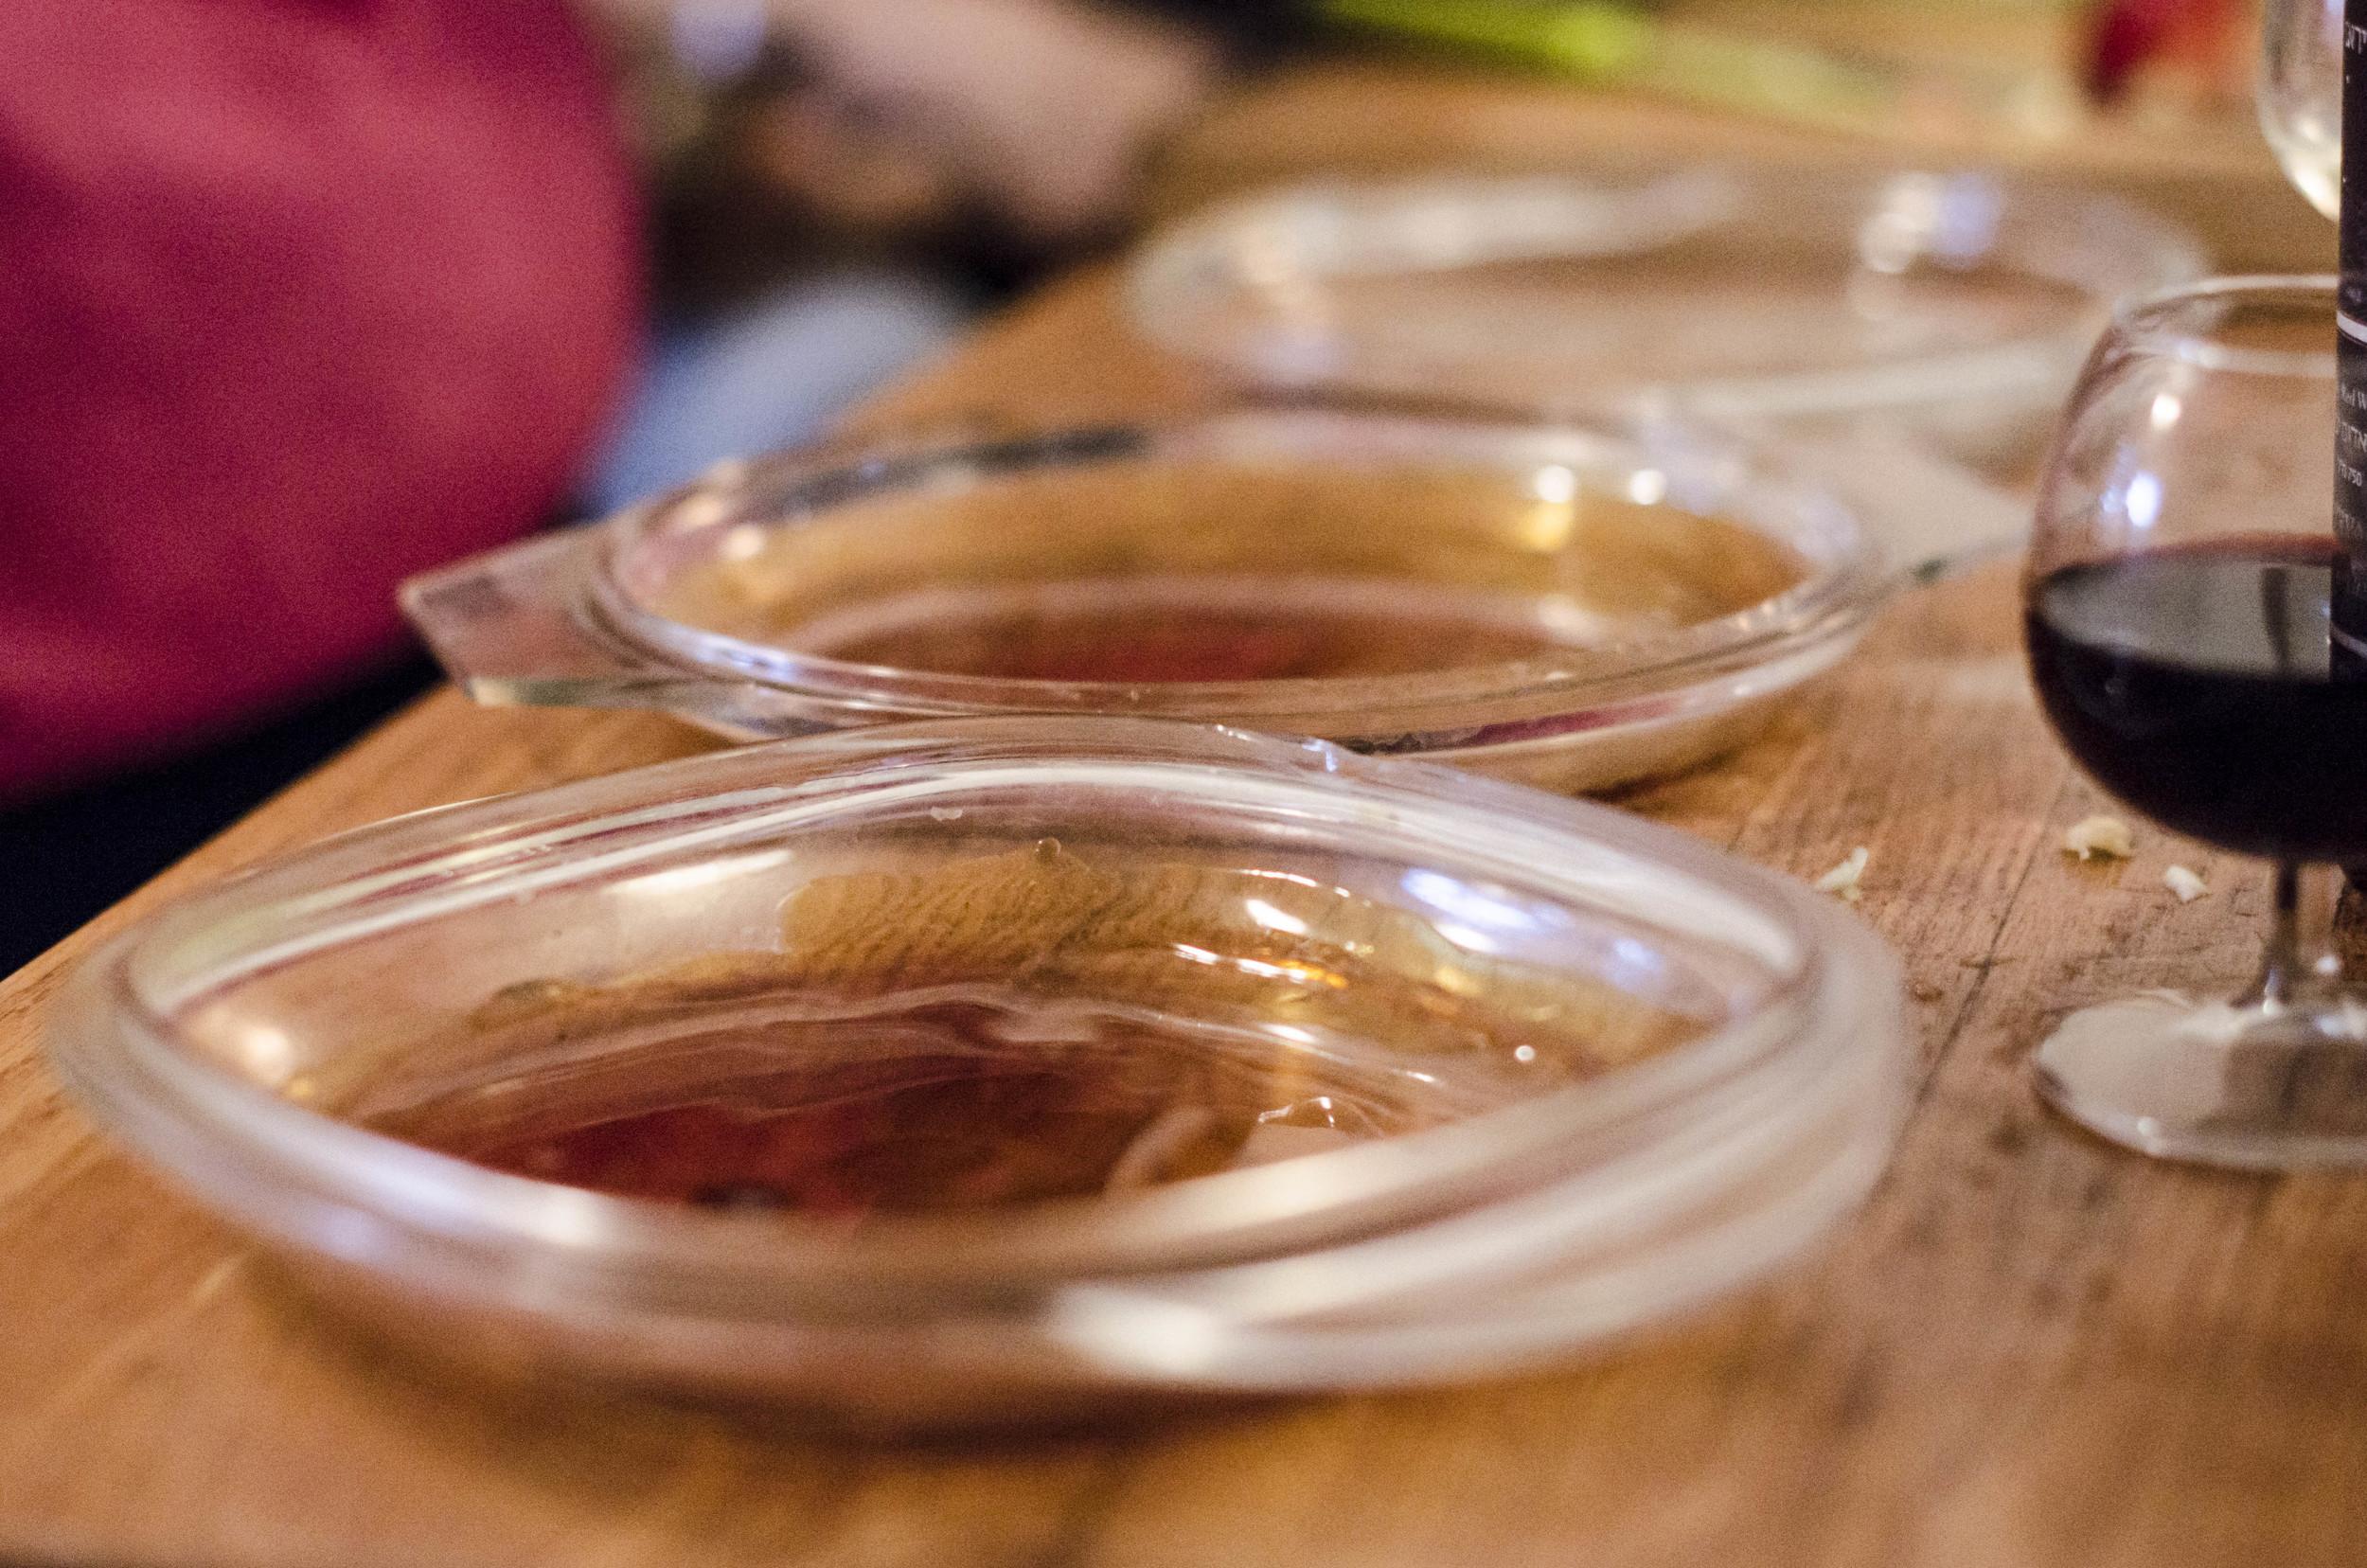 Apple Tarte Tatin -Caramel at the bottom